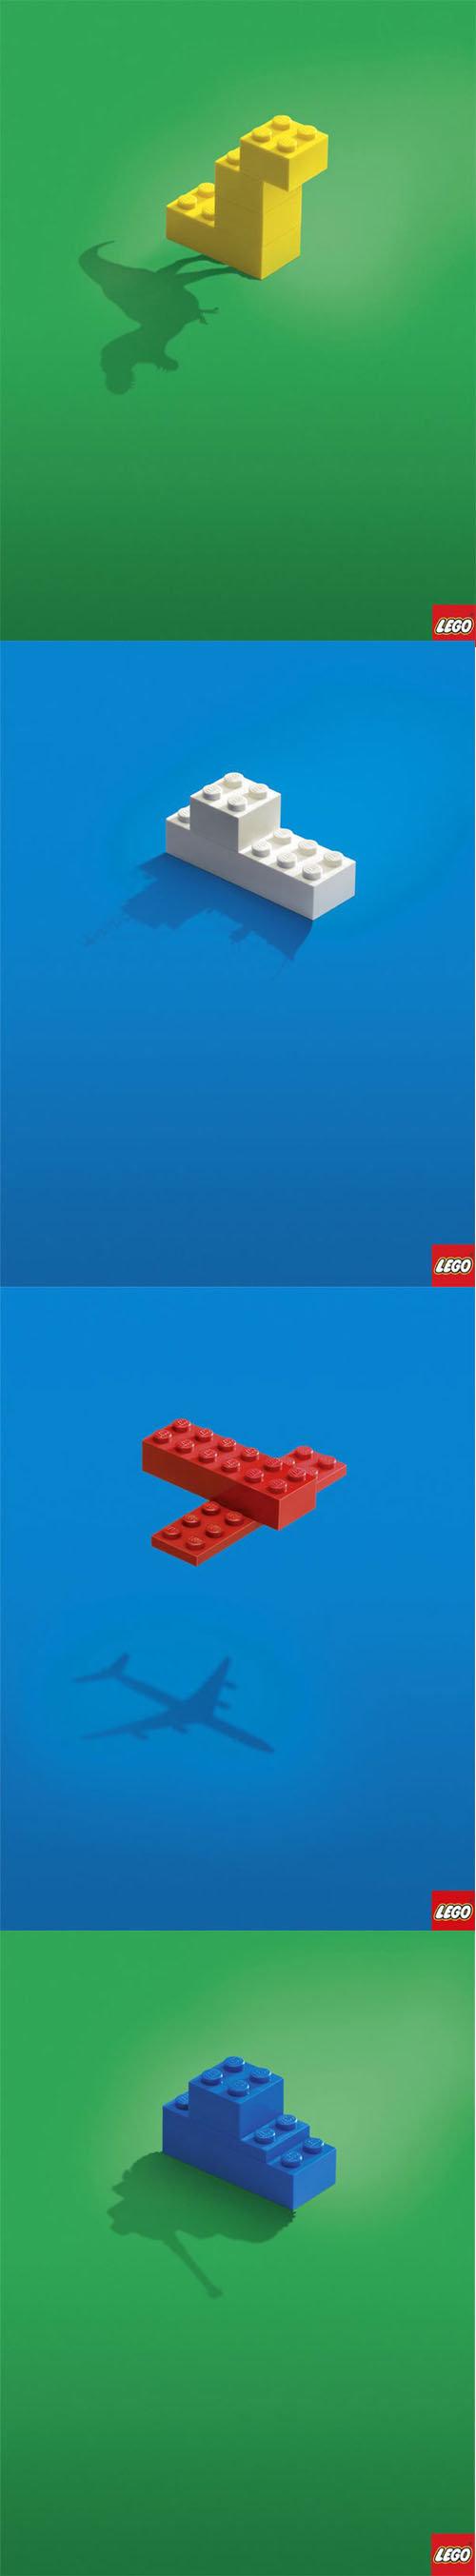 Legosaur. Do you have this kind of imagination?.. IMAGINATION